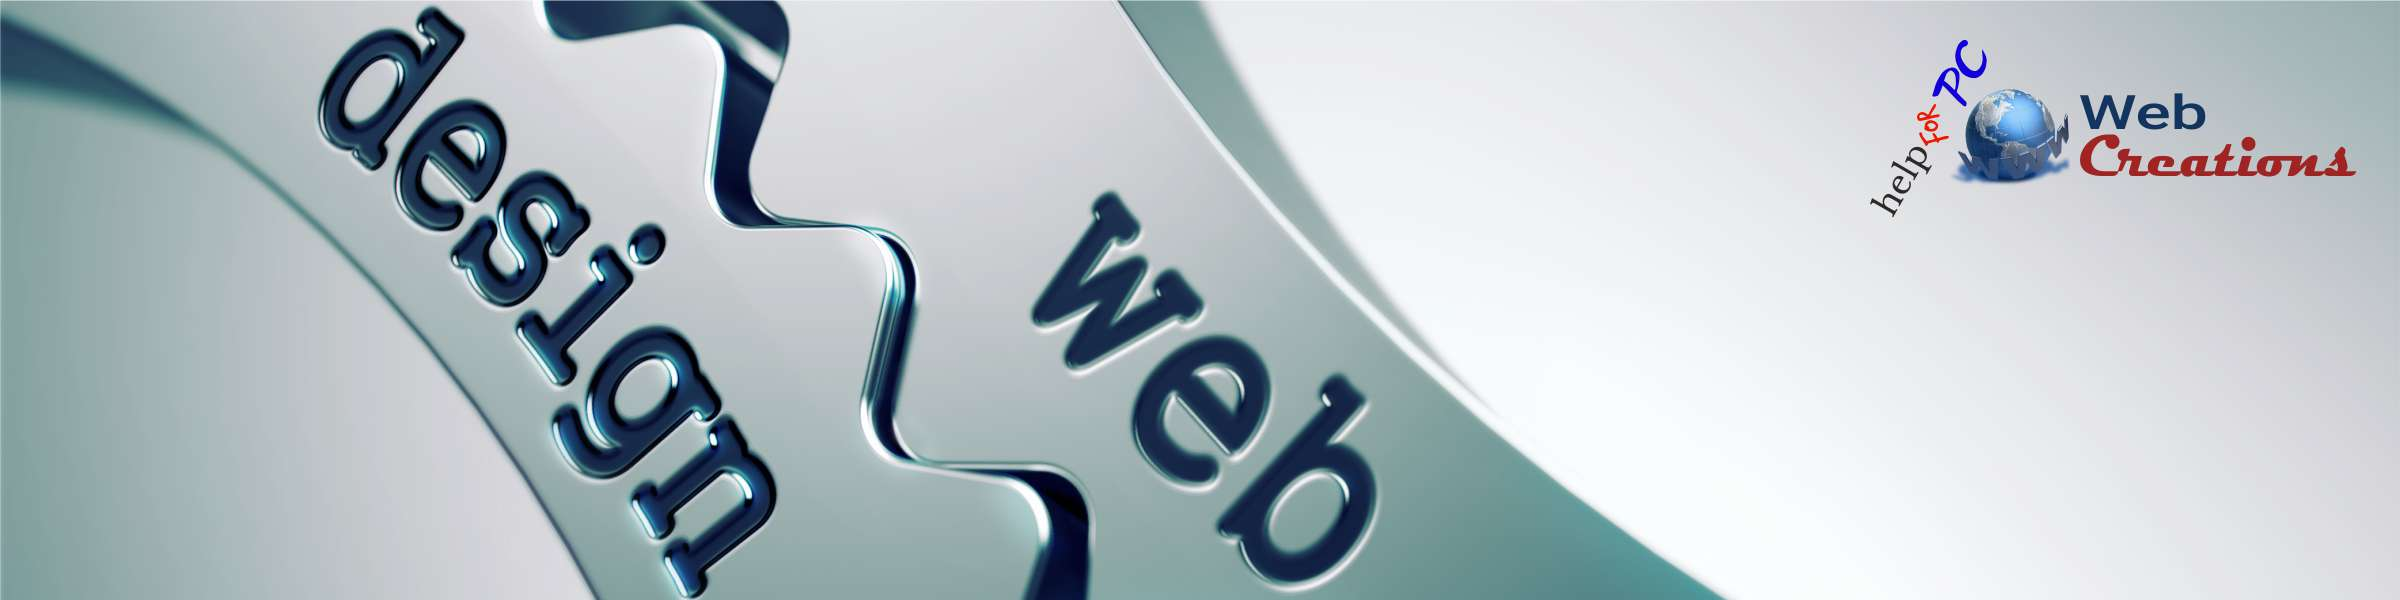 WebCreations | Κατασκευή Ιστοσελίδων & eshop | Θεσσαλονίκη